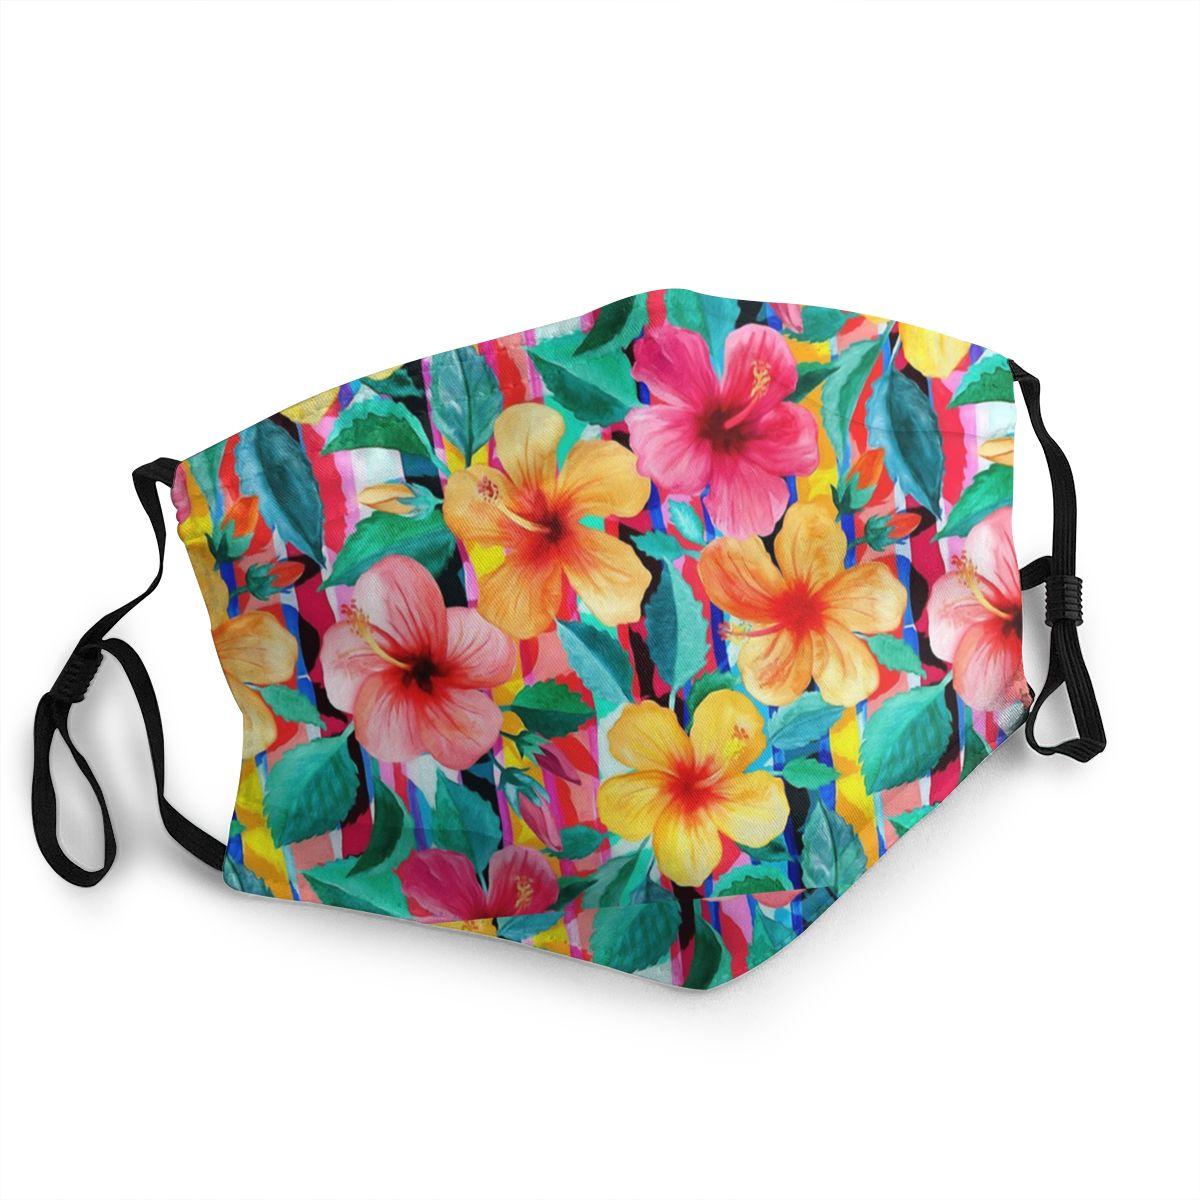 Hawaiian Hibiscus Floral Adult Reusable Face Mask Anti Haze Dustproof Mask Protection Mask Respirator Mouth Muffle